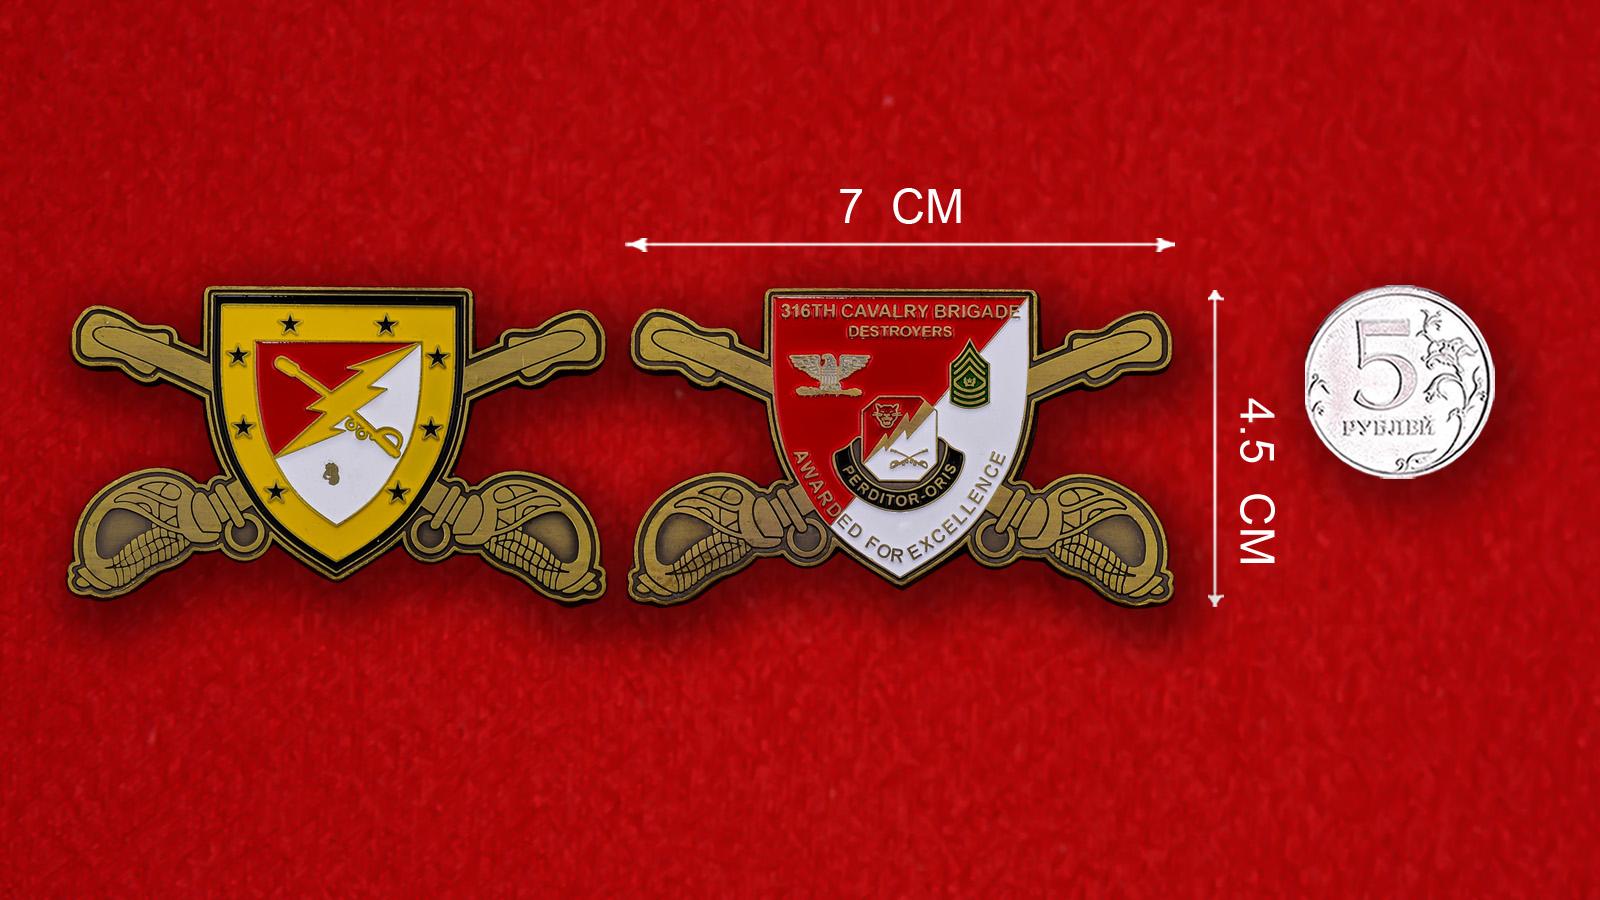 Челлендж коин 316-й Кавалерийской бригады армии США